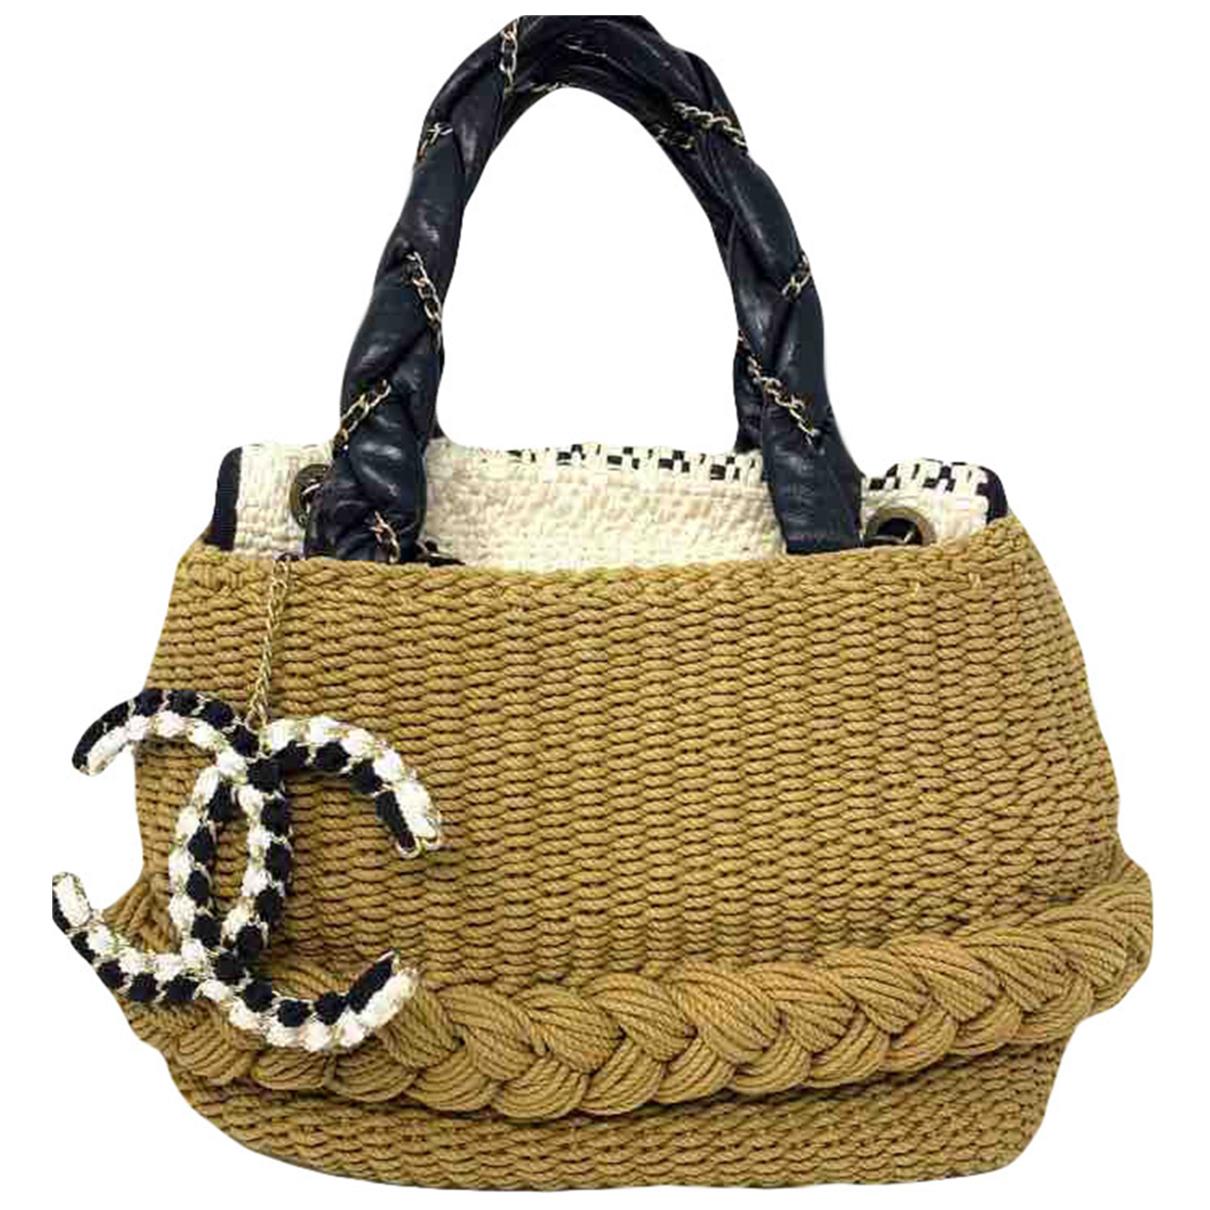 Chanel \N Beige Cotton handbag for Women \N